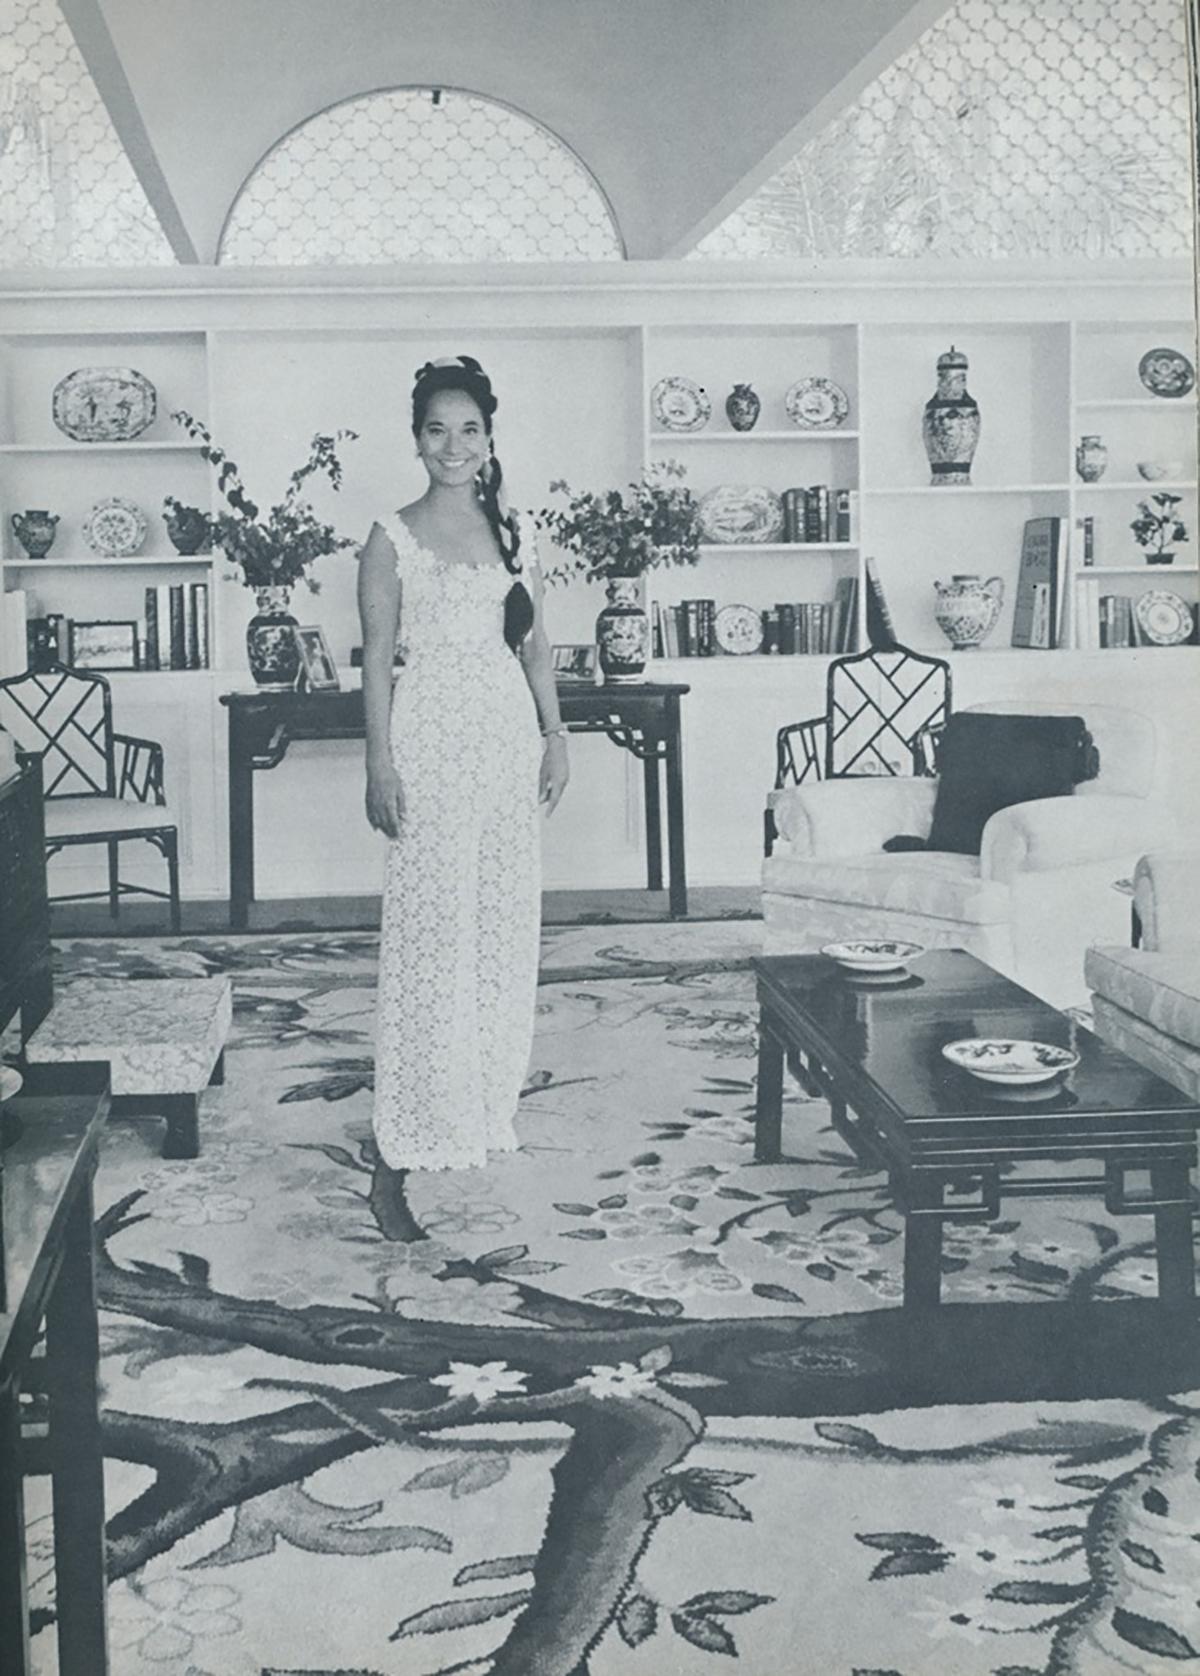 Merle Oberon, Acapulco, 1960s